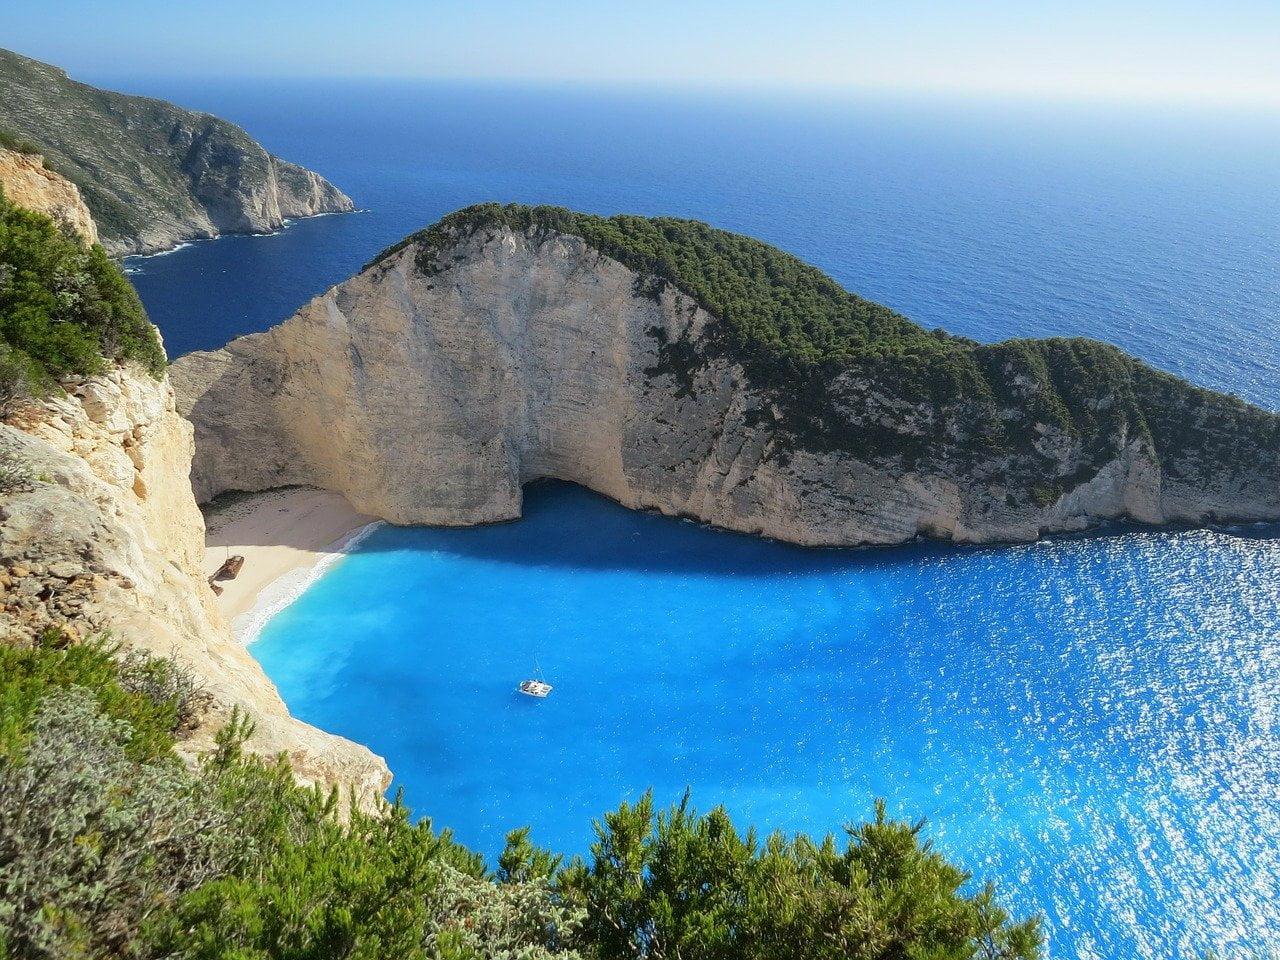 Atena impune măsuri la sânge! Vacanța românilor în Grecia, în pericol!